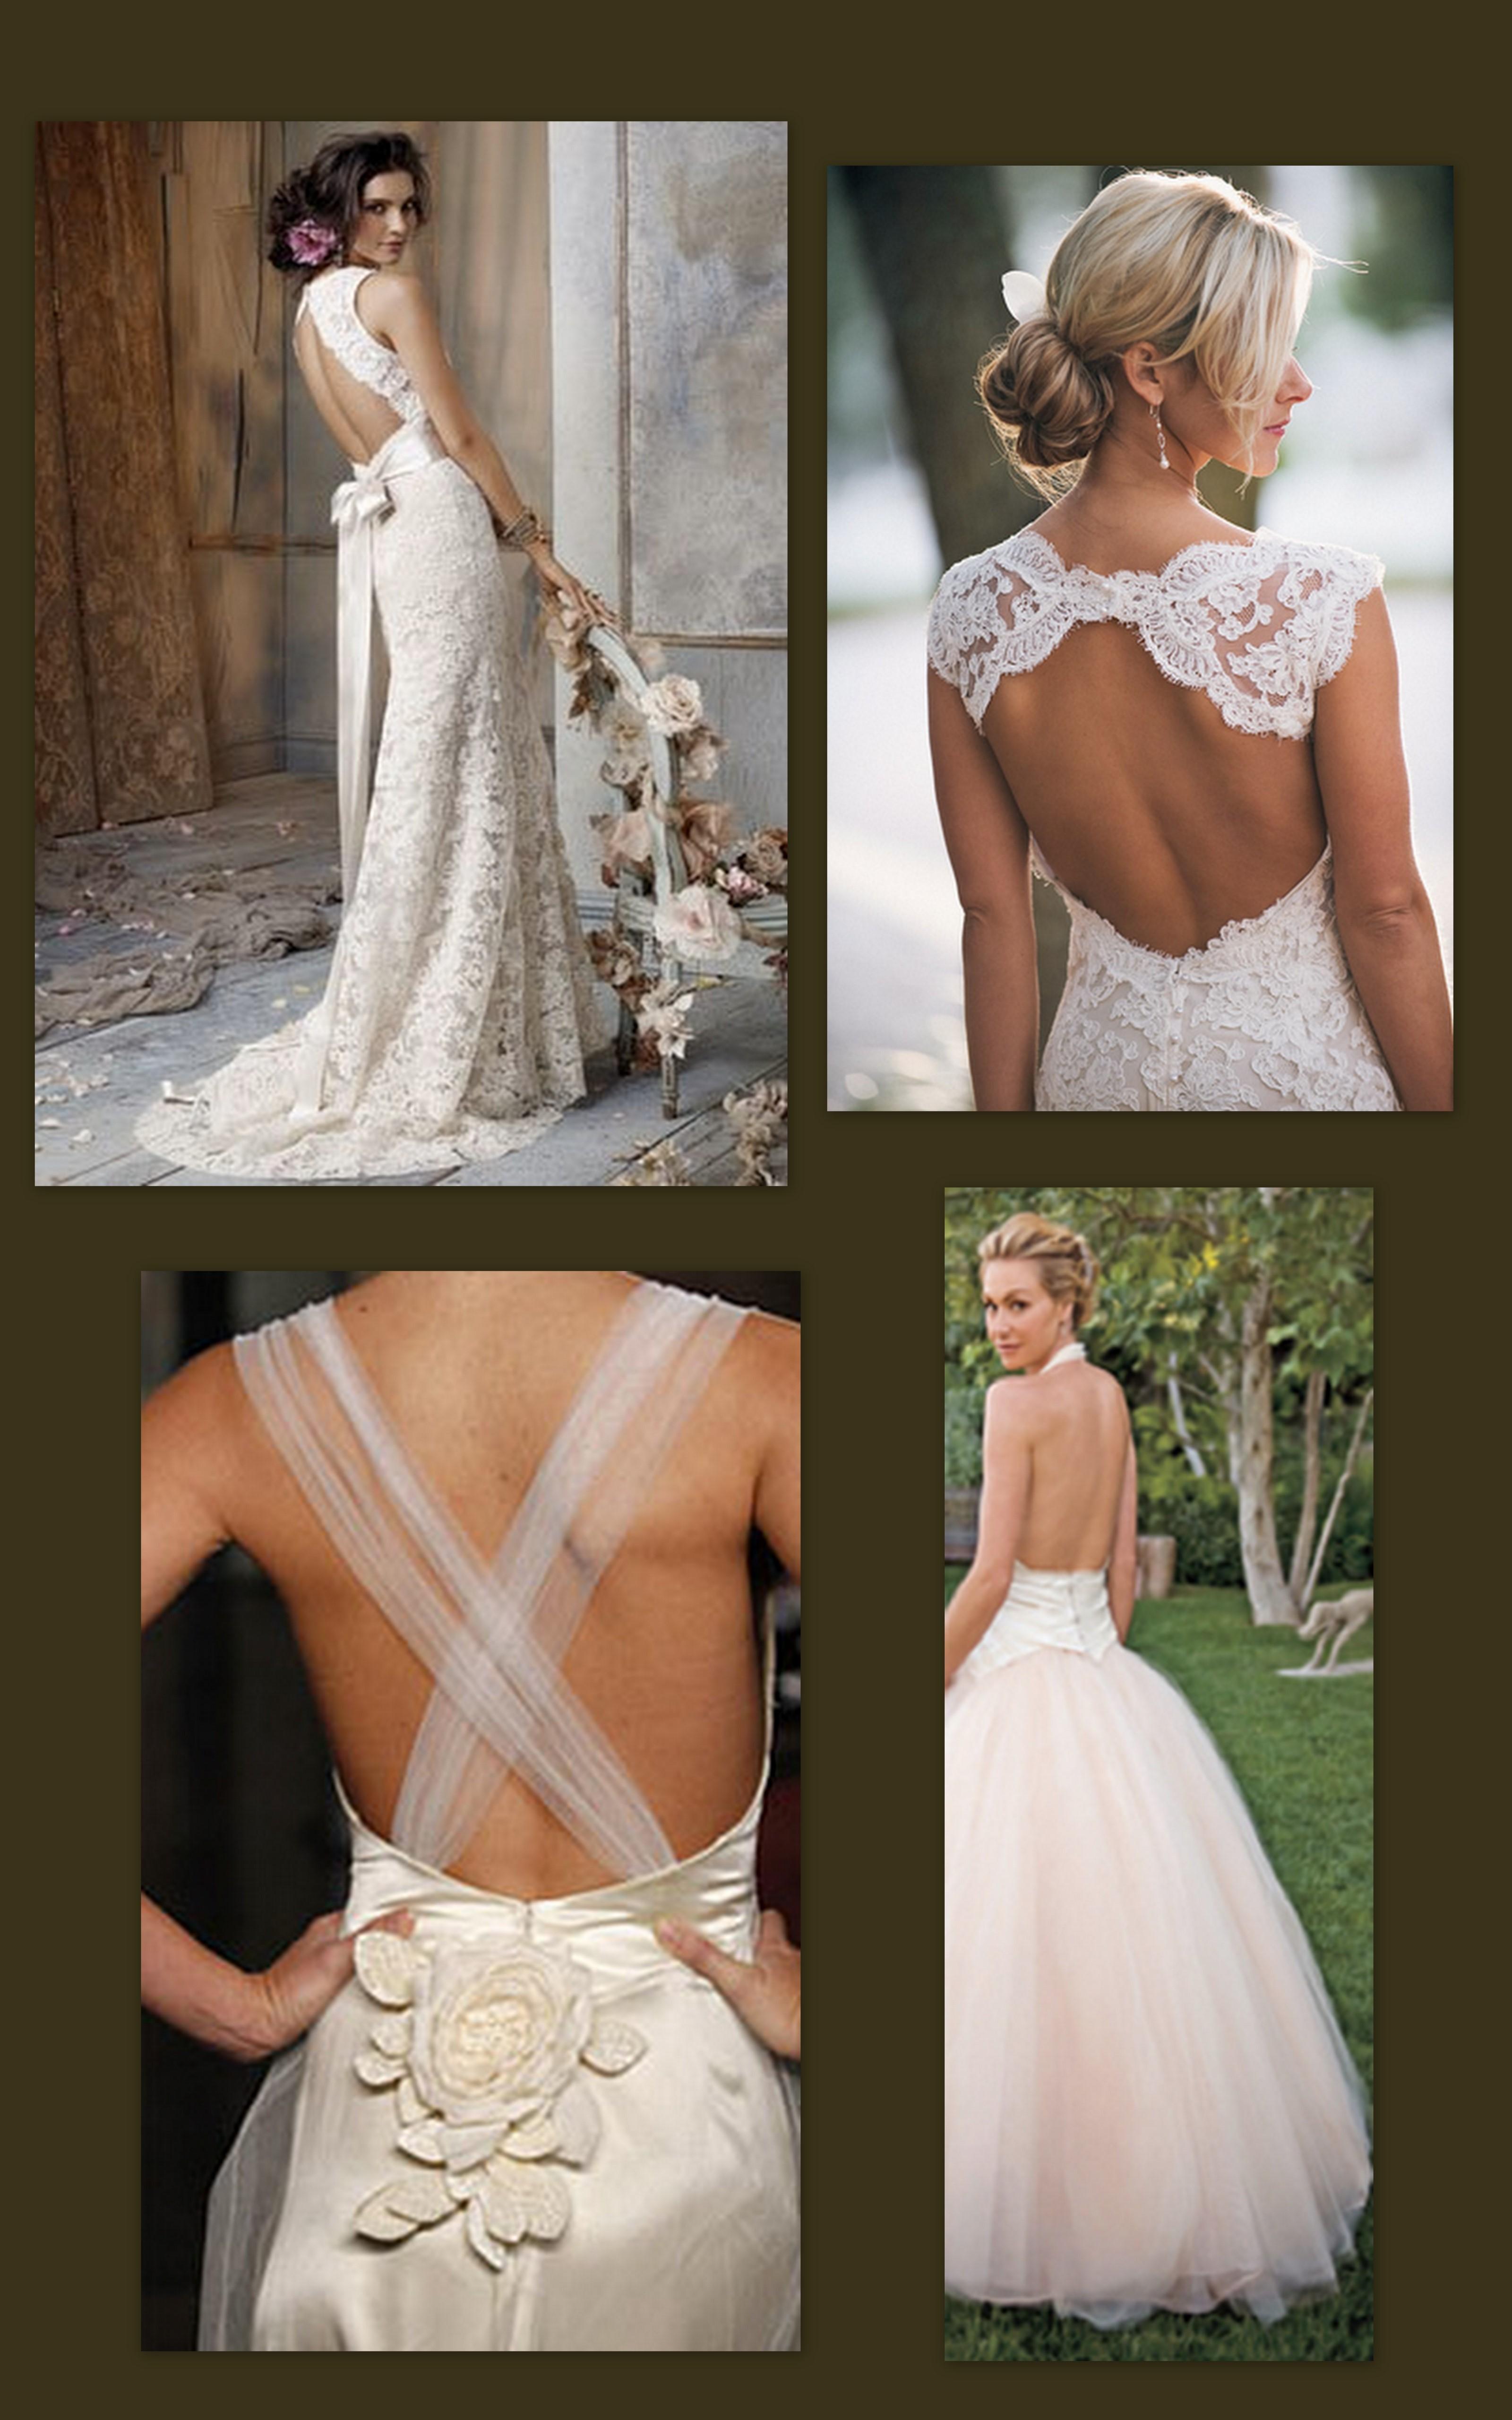 Backless Wedding Dress 2011